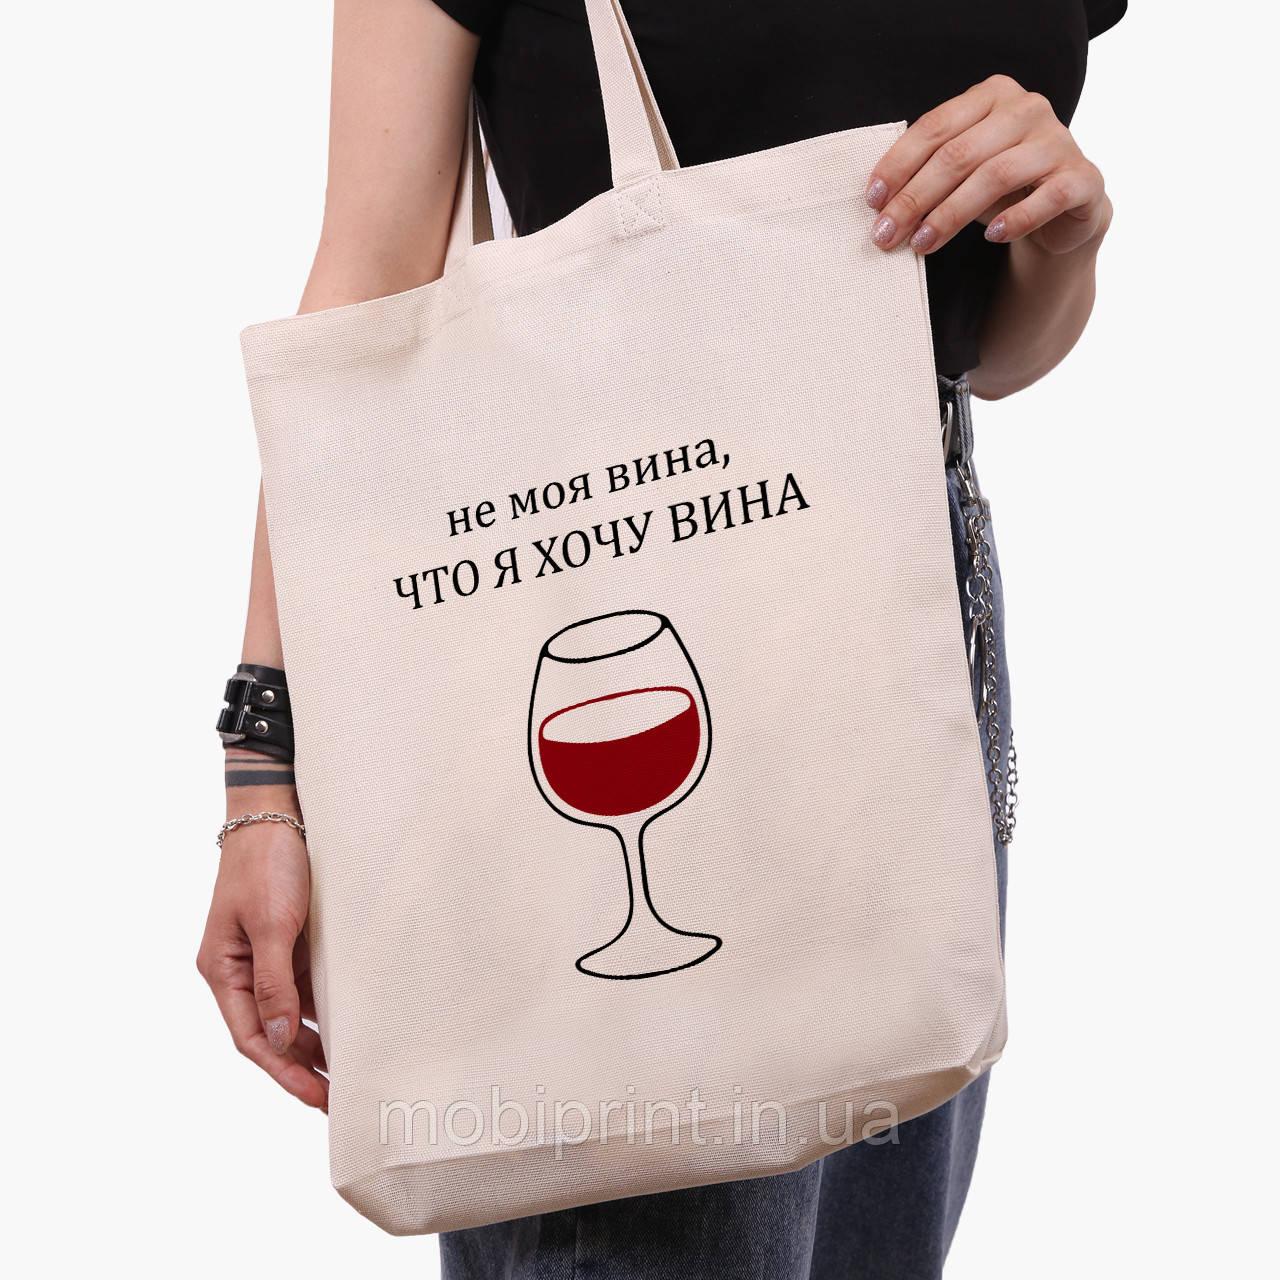 Еко сумка шоппер біла Не моя вина, що я хочу вина (it's not my fault that I want wine) (9227-1783-1) 41*39*8